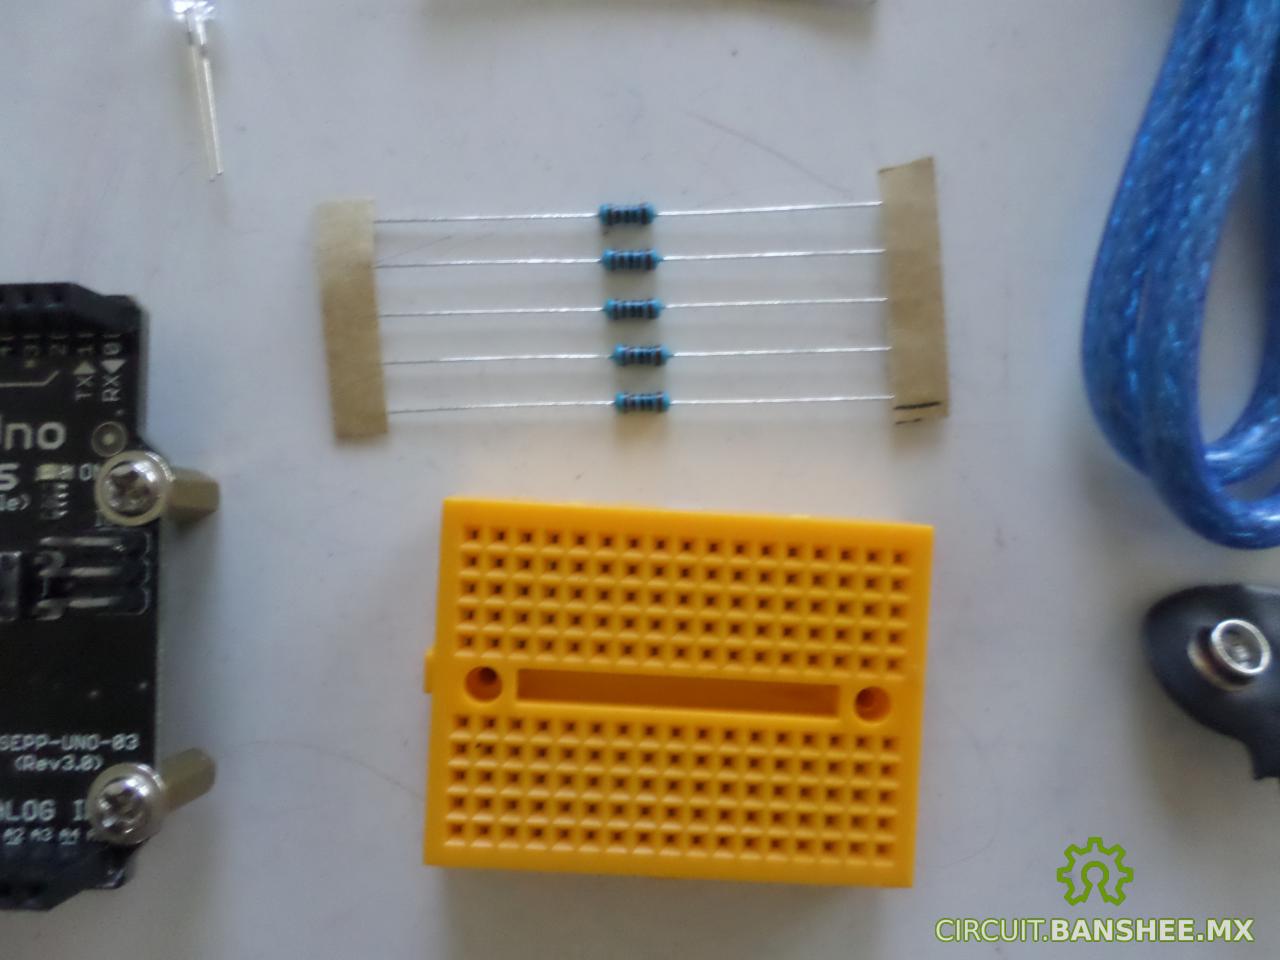 Kits de desarrollo arduino banshee mx